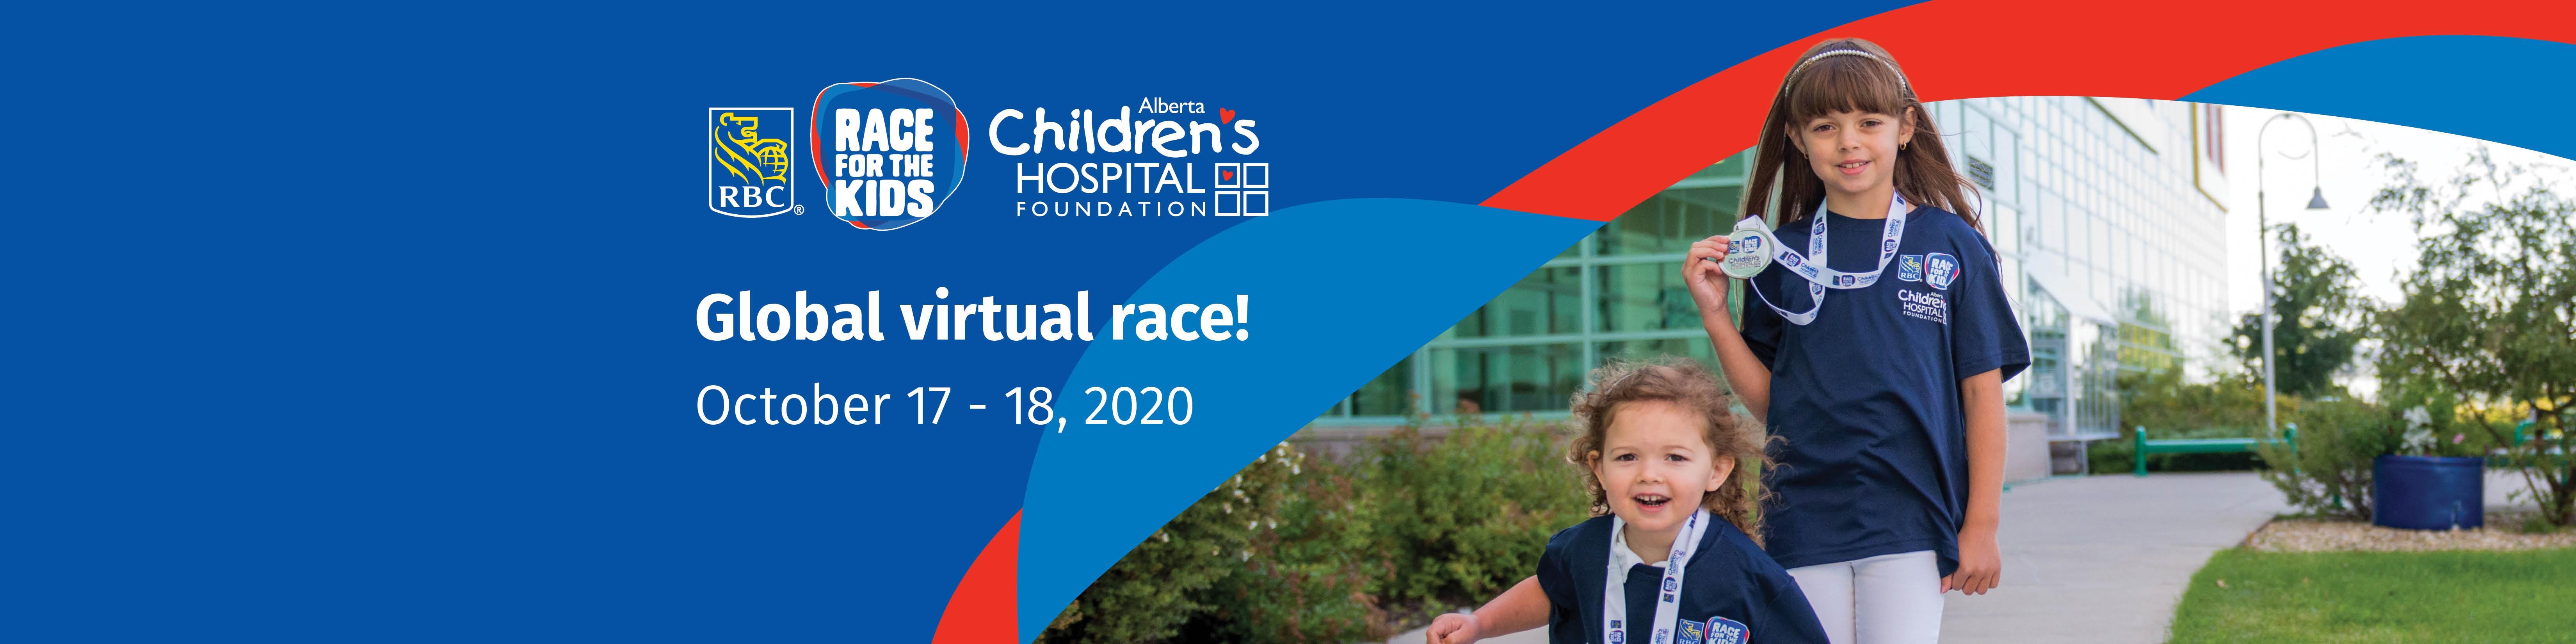 Alberta Children S Hospital Foundation Linkedin